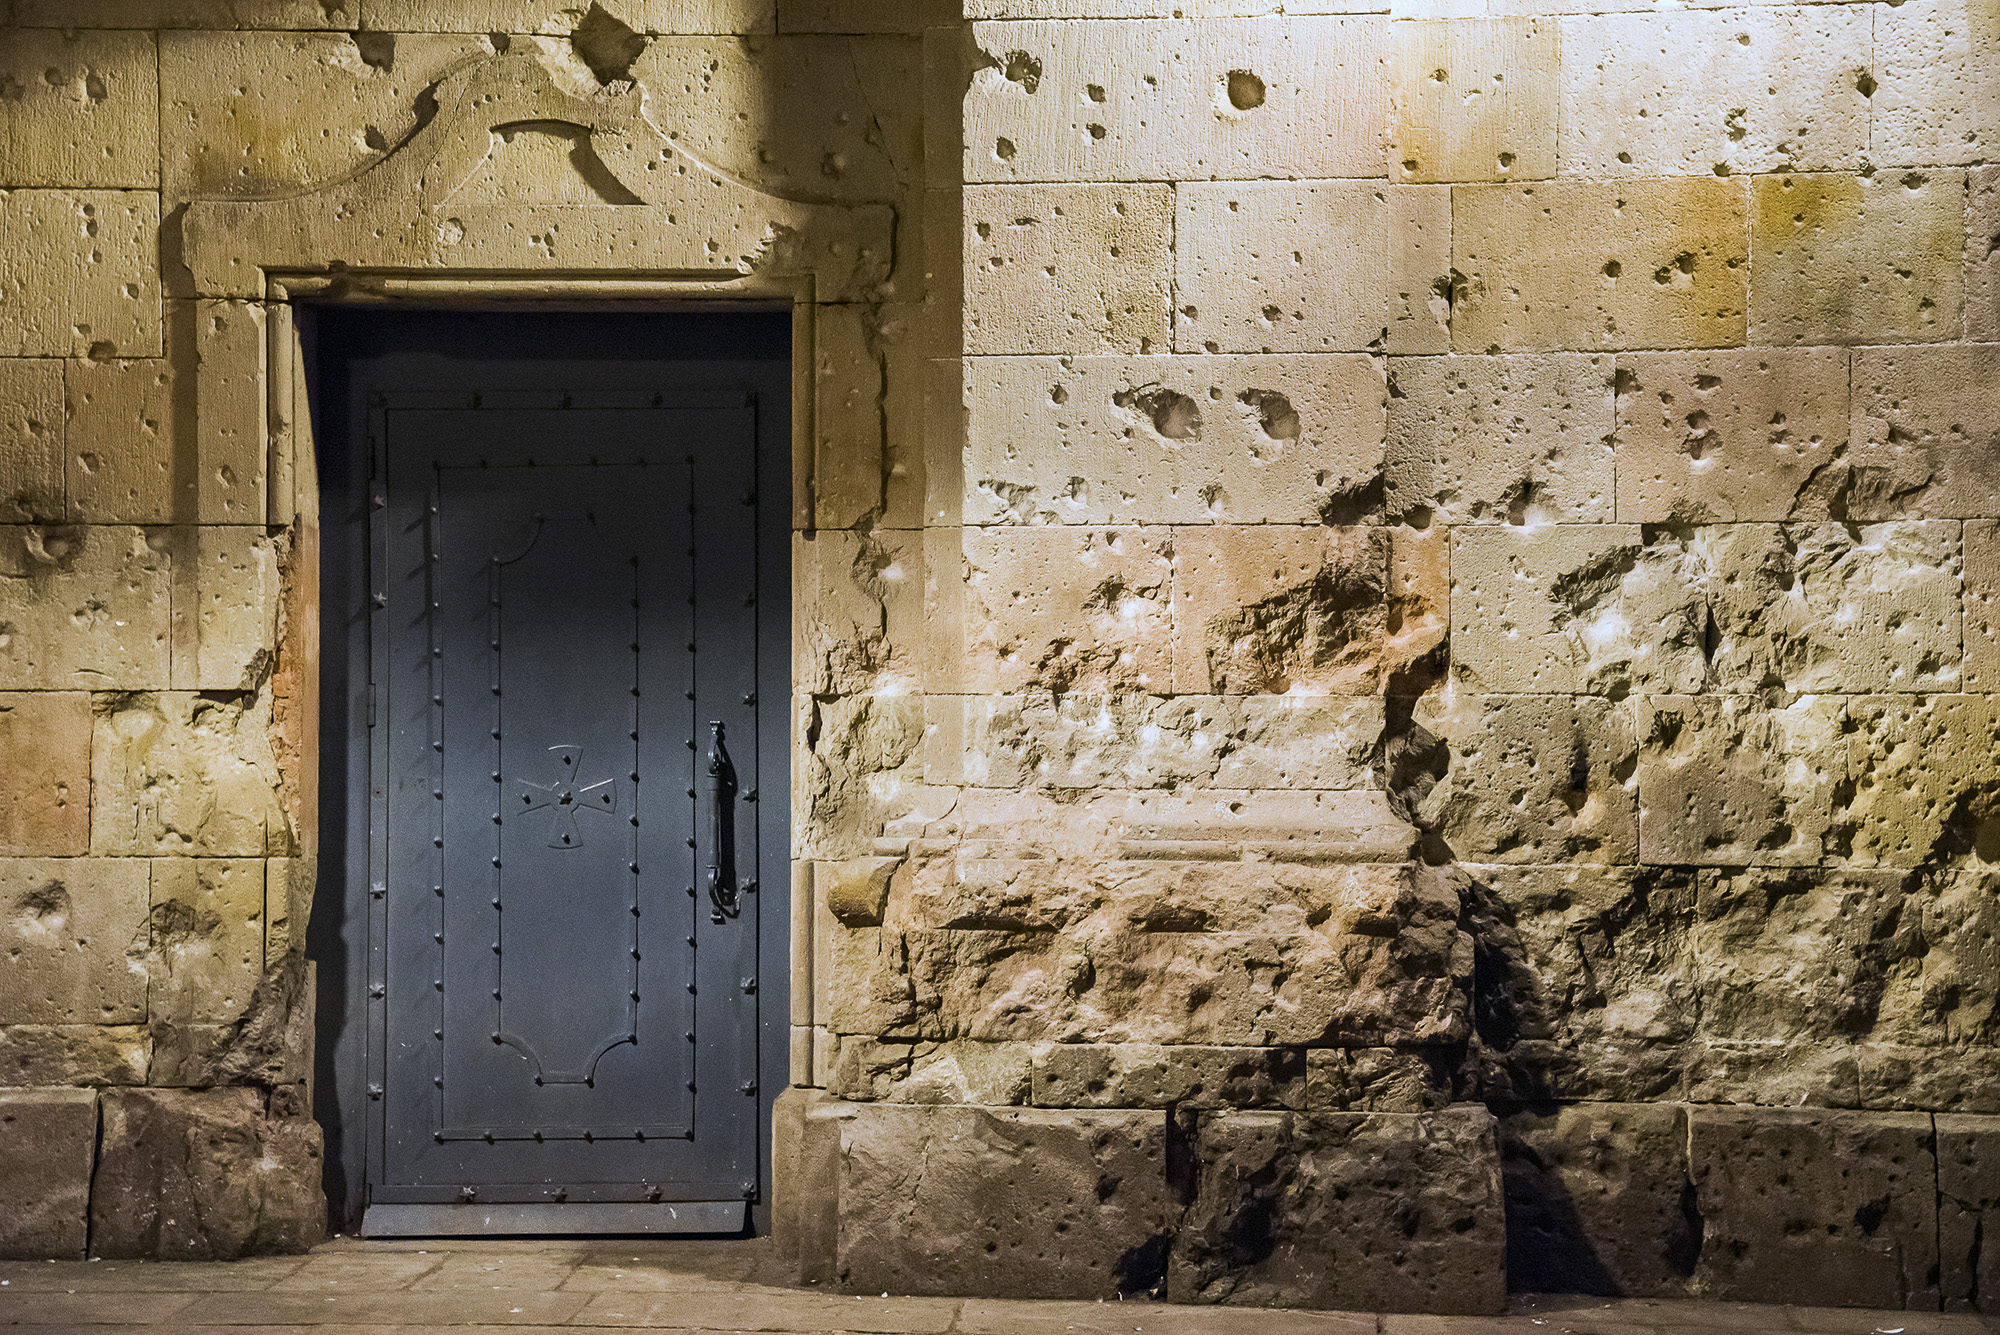 Barcelona-Delphine-012-aperture-tours.jpg